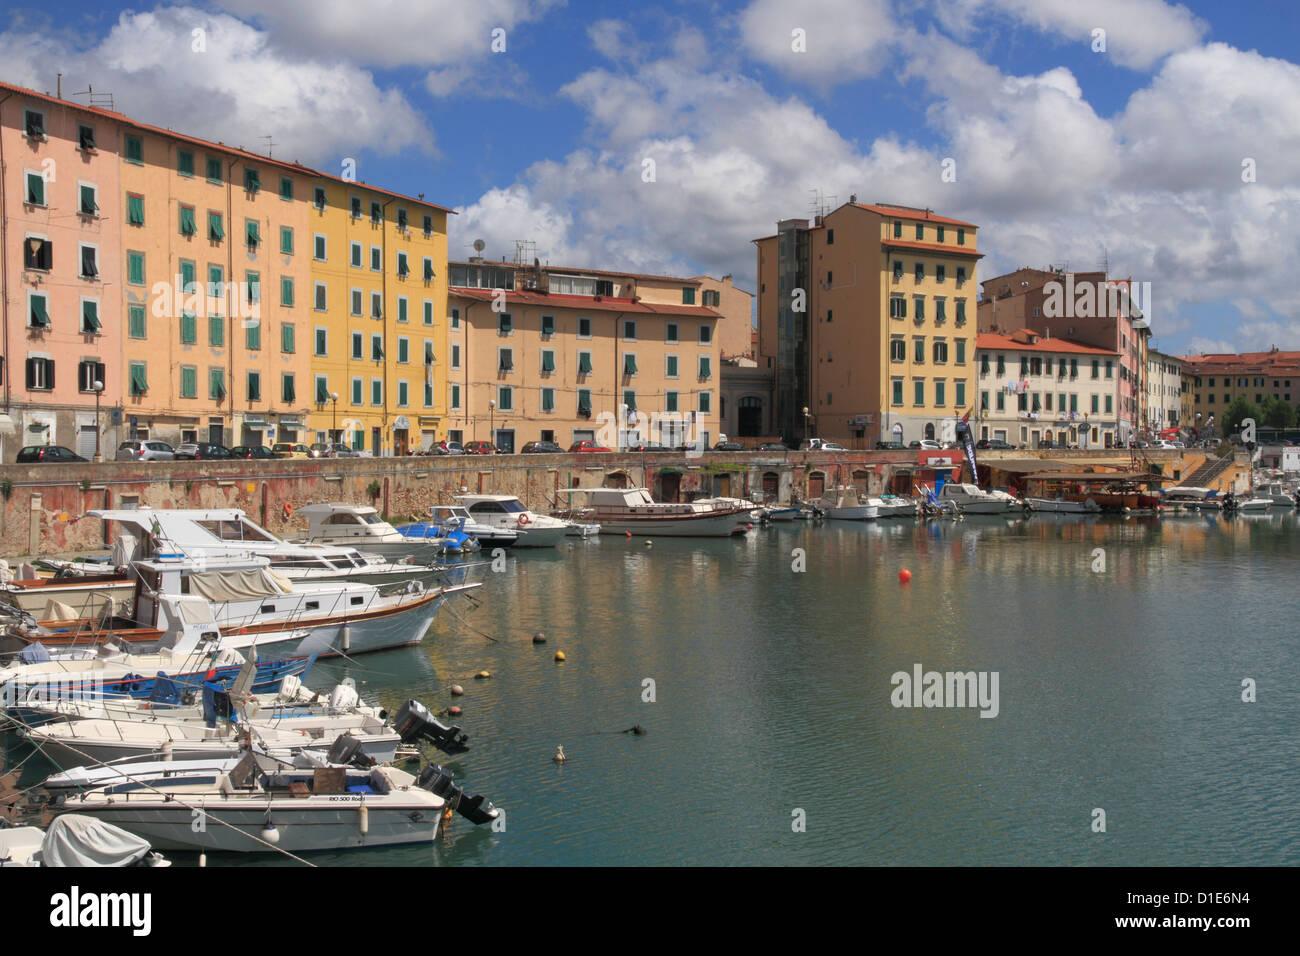 Fosso Reale, Livorno, Tuscany, Italy, Europe - Stock Image